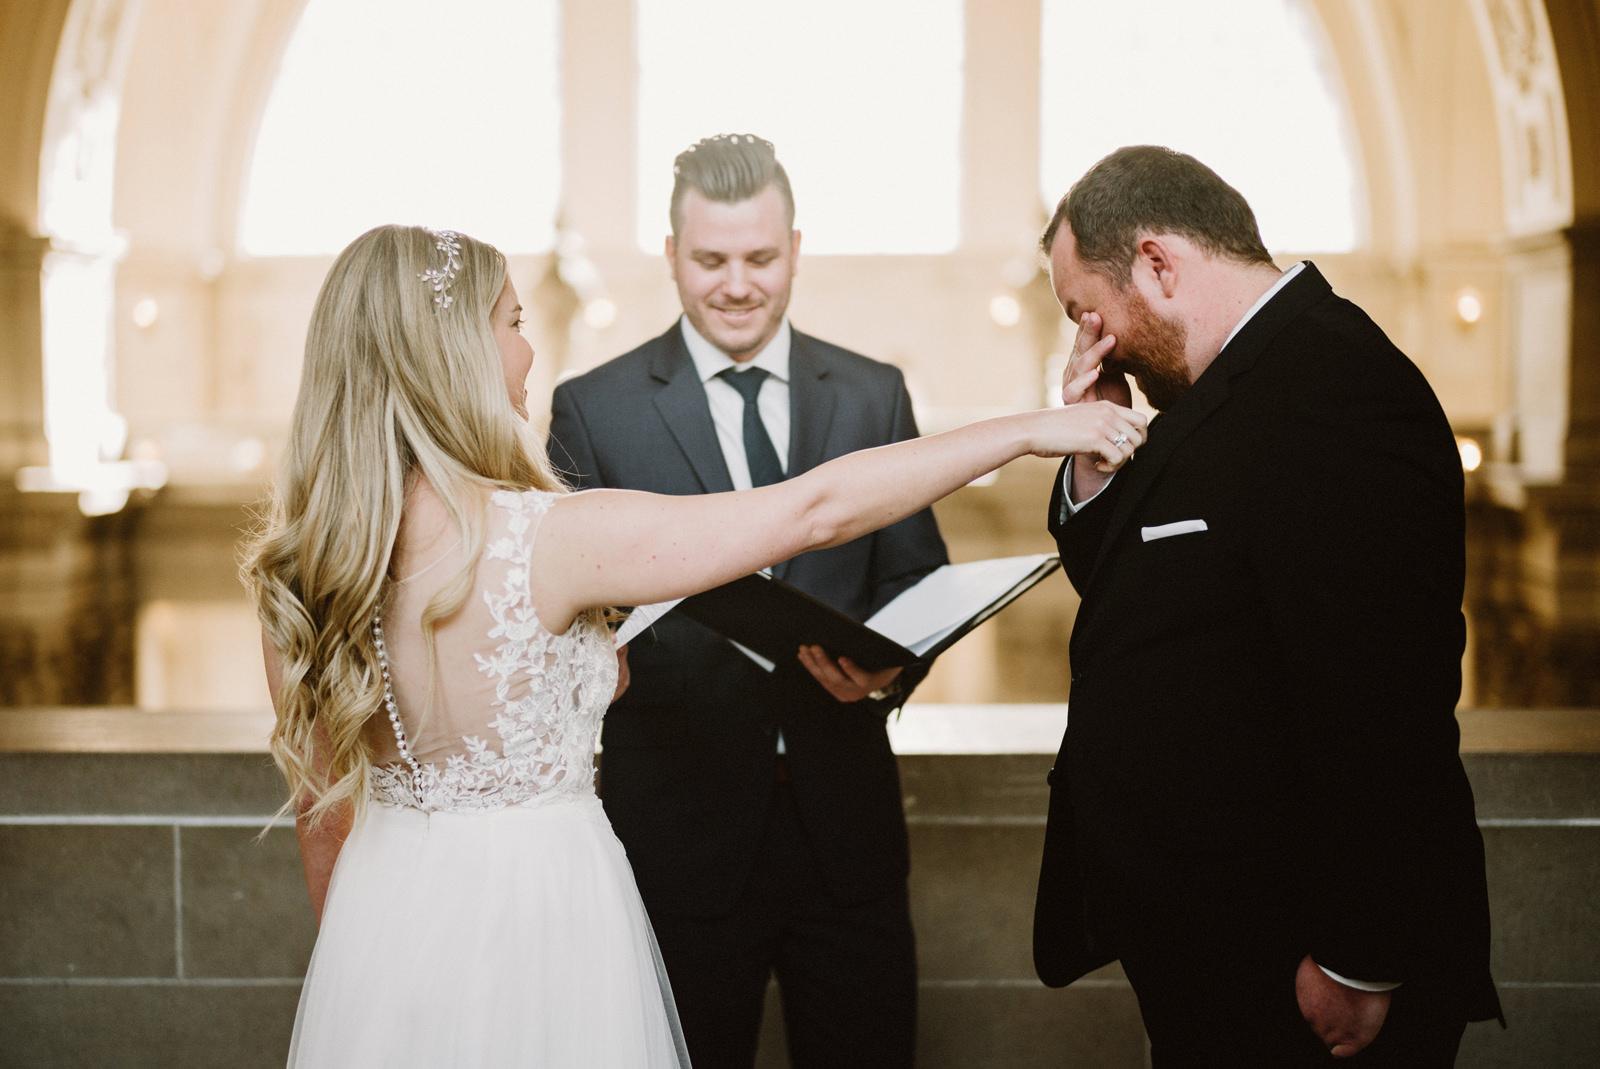 san-francisco-city-hall-elopement-20 SAN FRANCISCO CITY HALL INTIMATE WEDDING